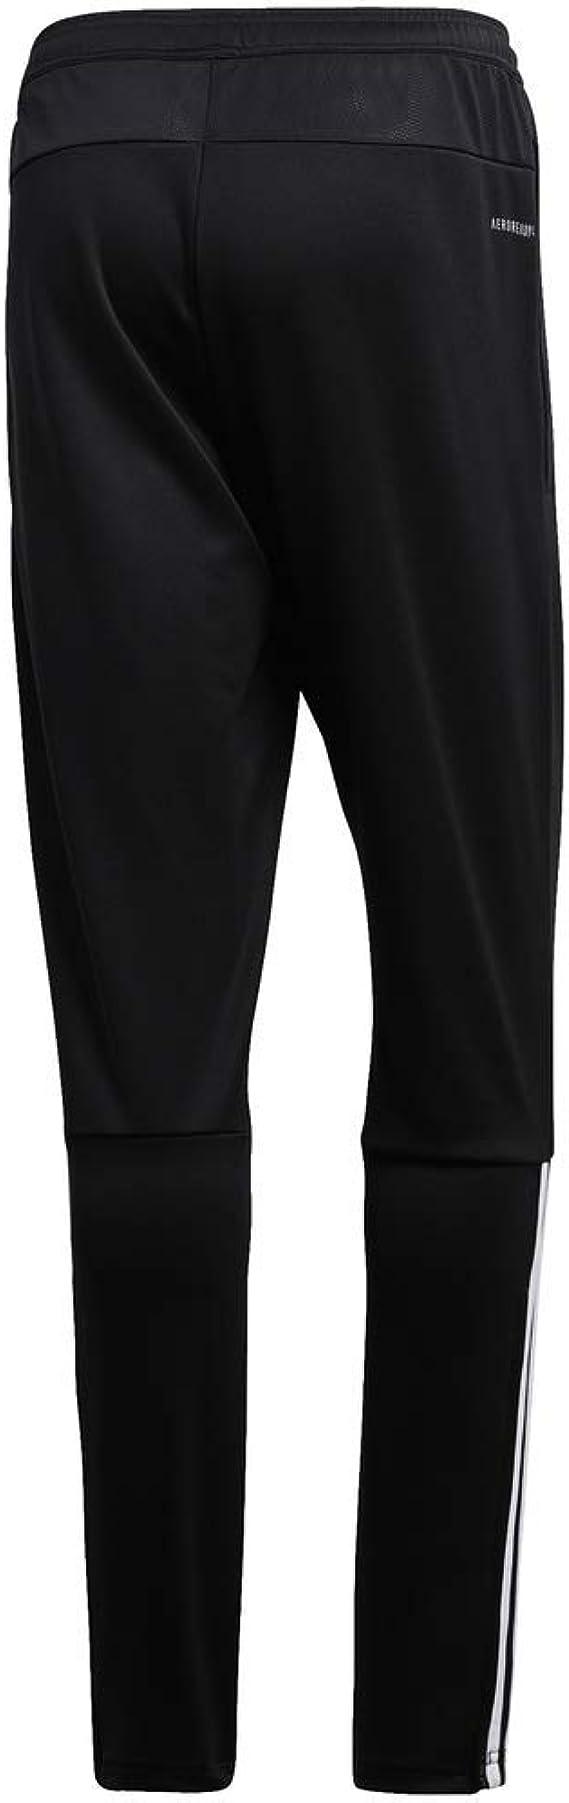 Adidas Regi 18 Track Pants Mens ClimaCool Sports trousers Pants Black